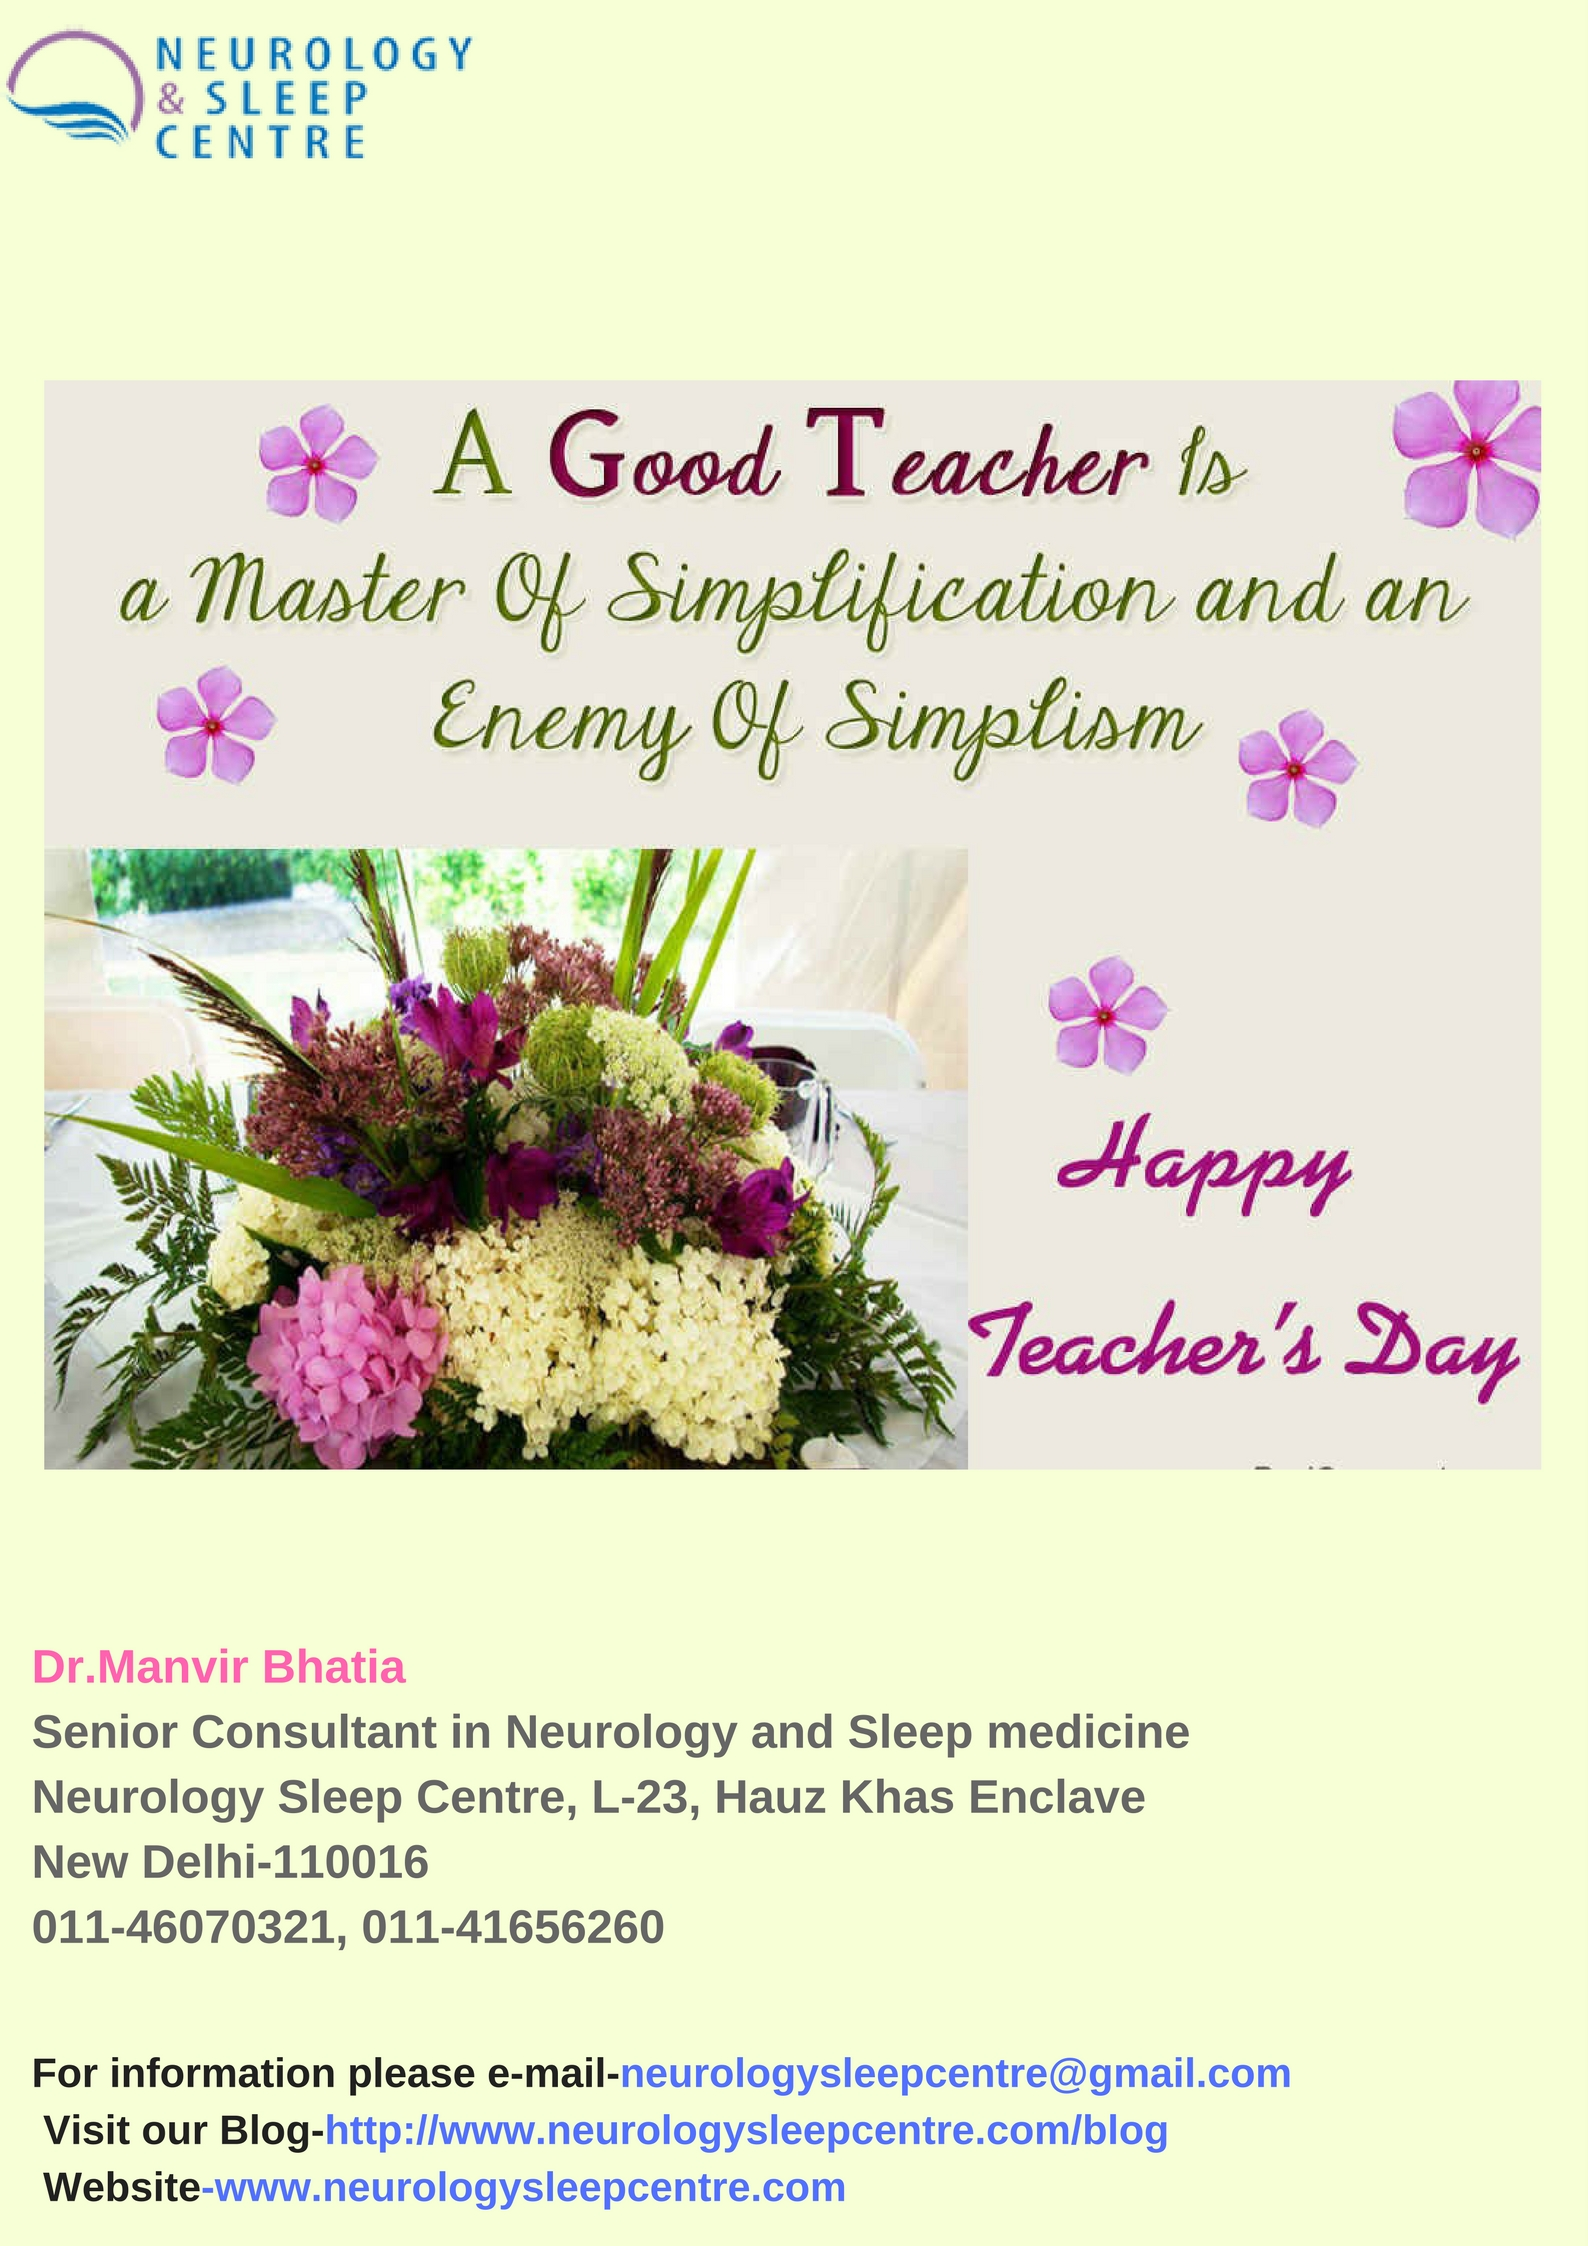 Dr.Manvir BhatiaSenior Consultant in Neurology and Sleep medicineNeurology Sleep Centre, L-23, Hauz Khas EnclaveNew Delhi-110016011-46070321, 011-41656260 (1)